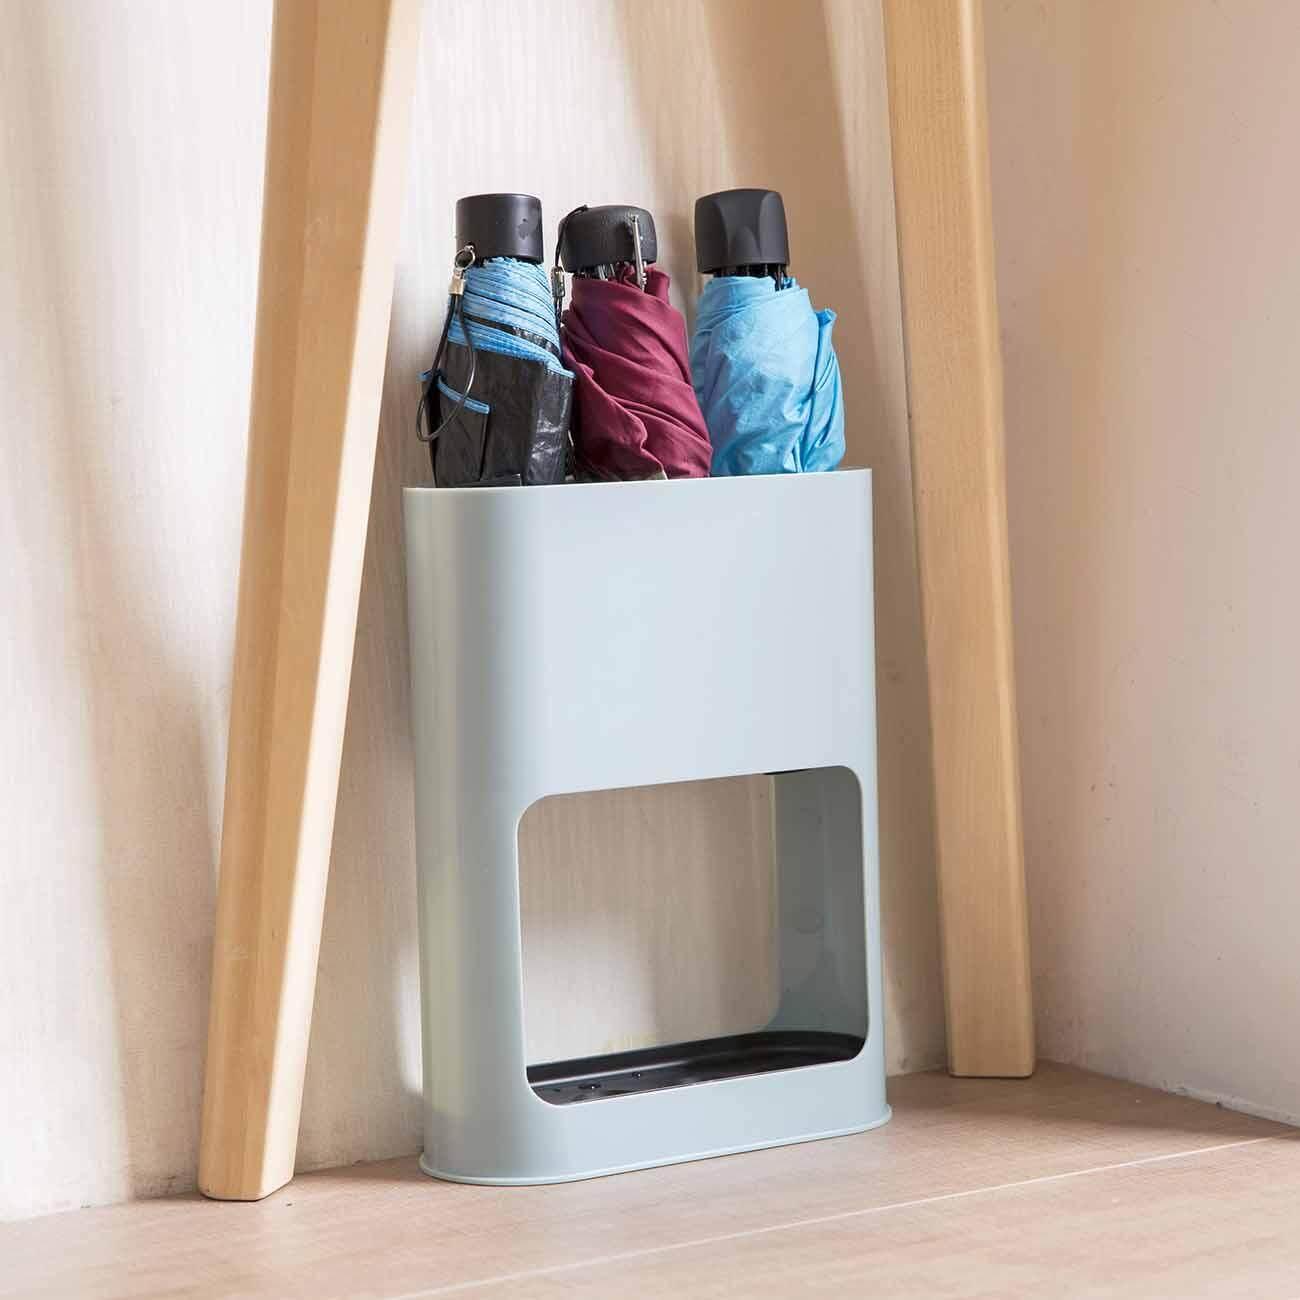 Homenhome Umbrella Holder Stand Dryer Organizer Plastic Home Office Restaurant Decor